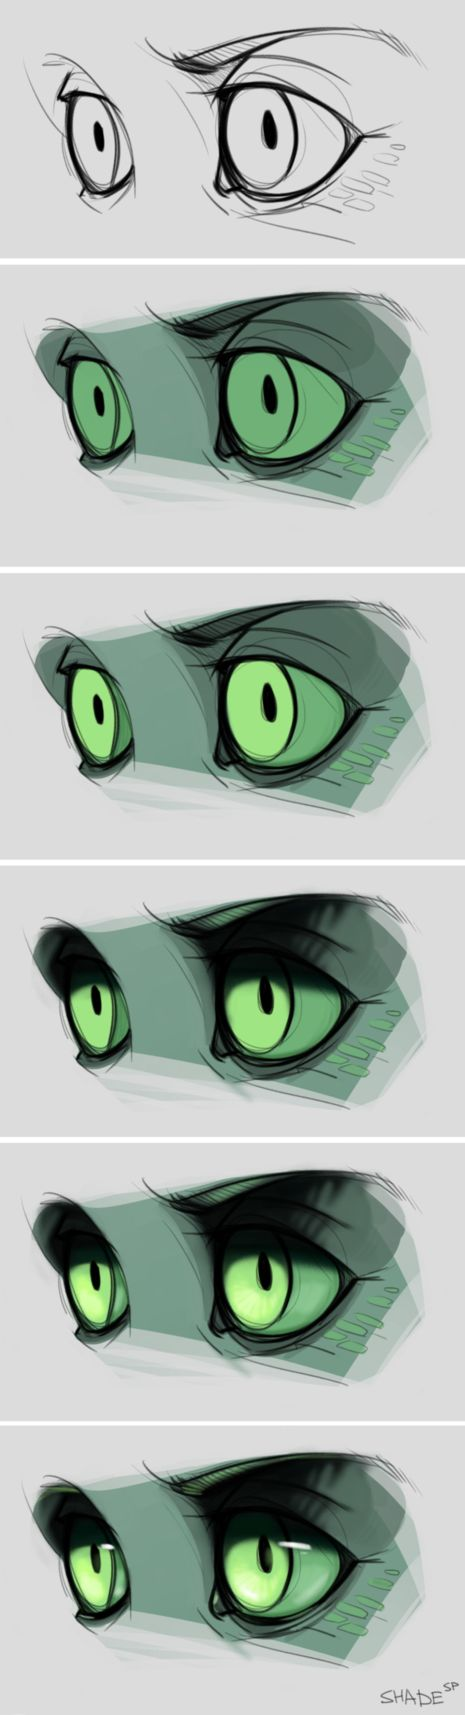 Eyes coloring by SHADE-ShyPervert